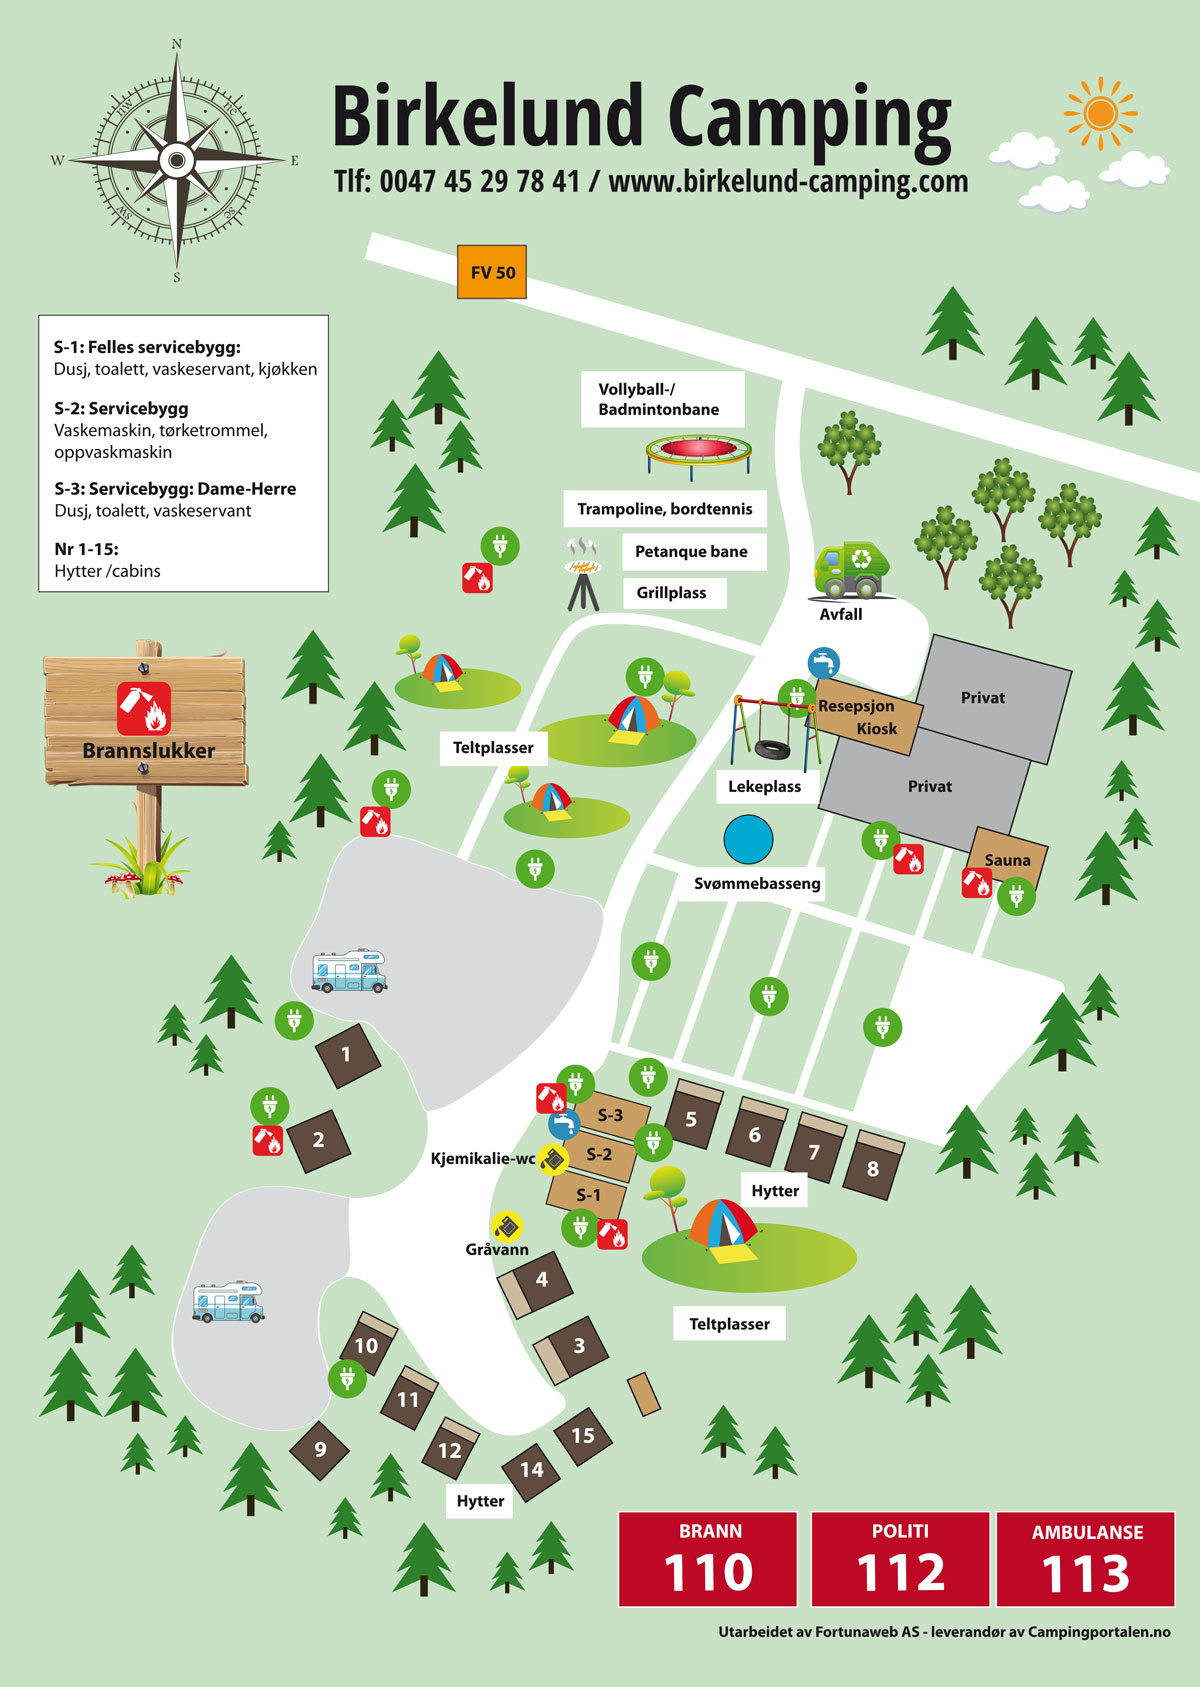 Camping map - Birkelund Camping